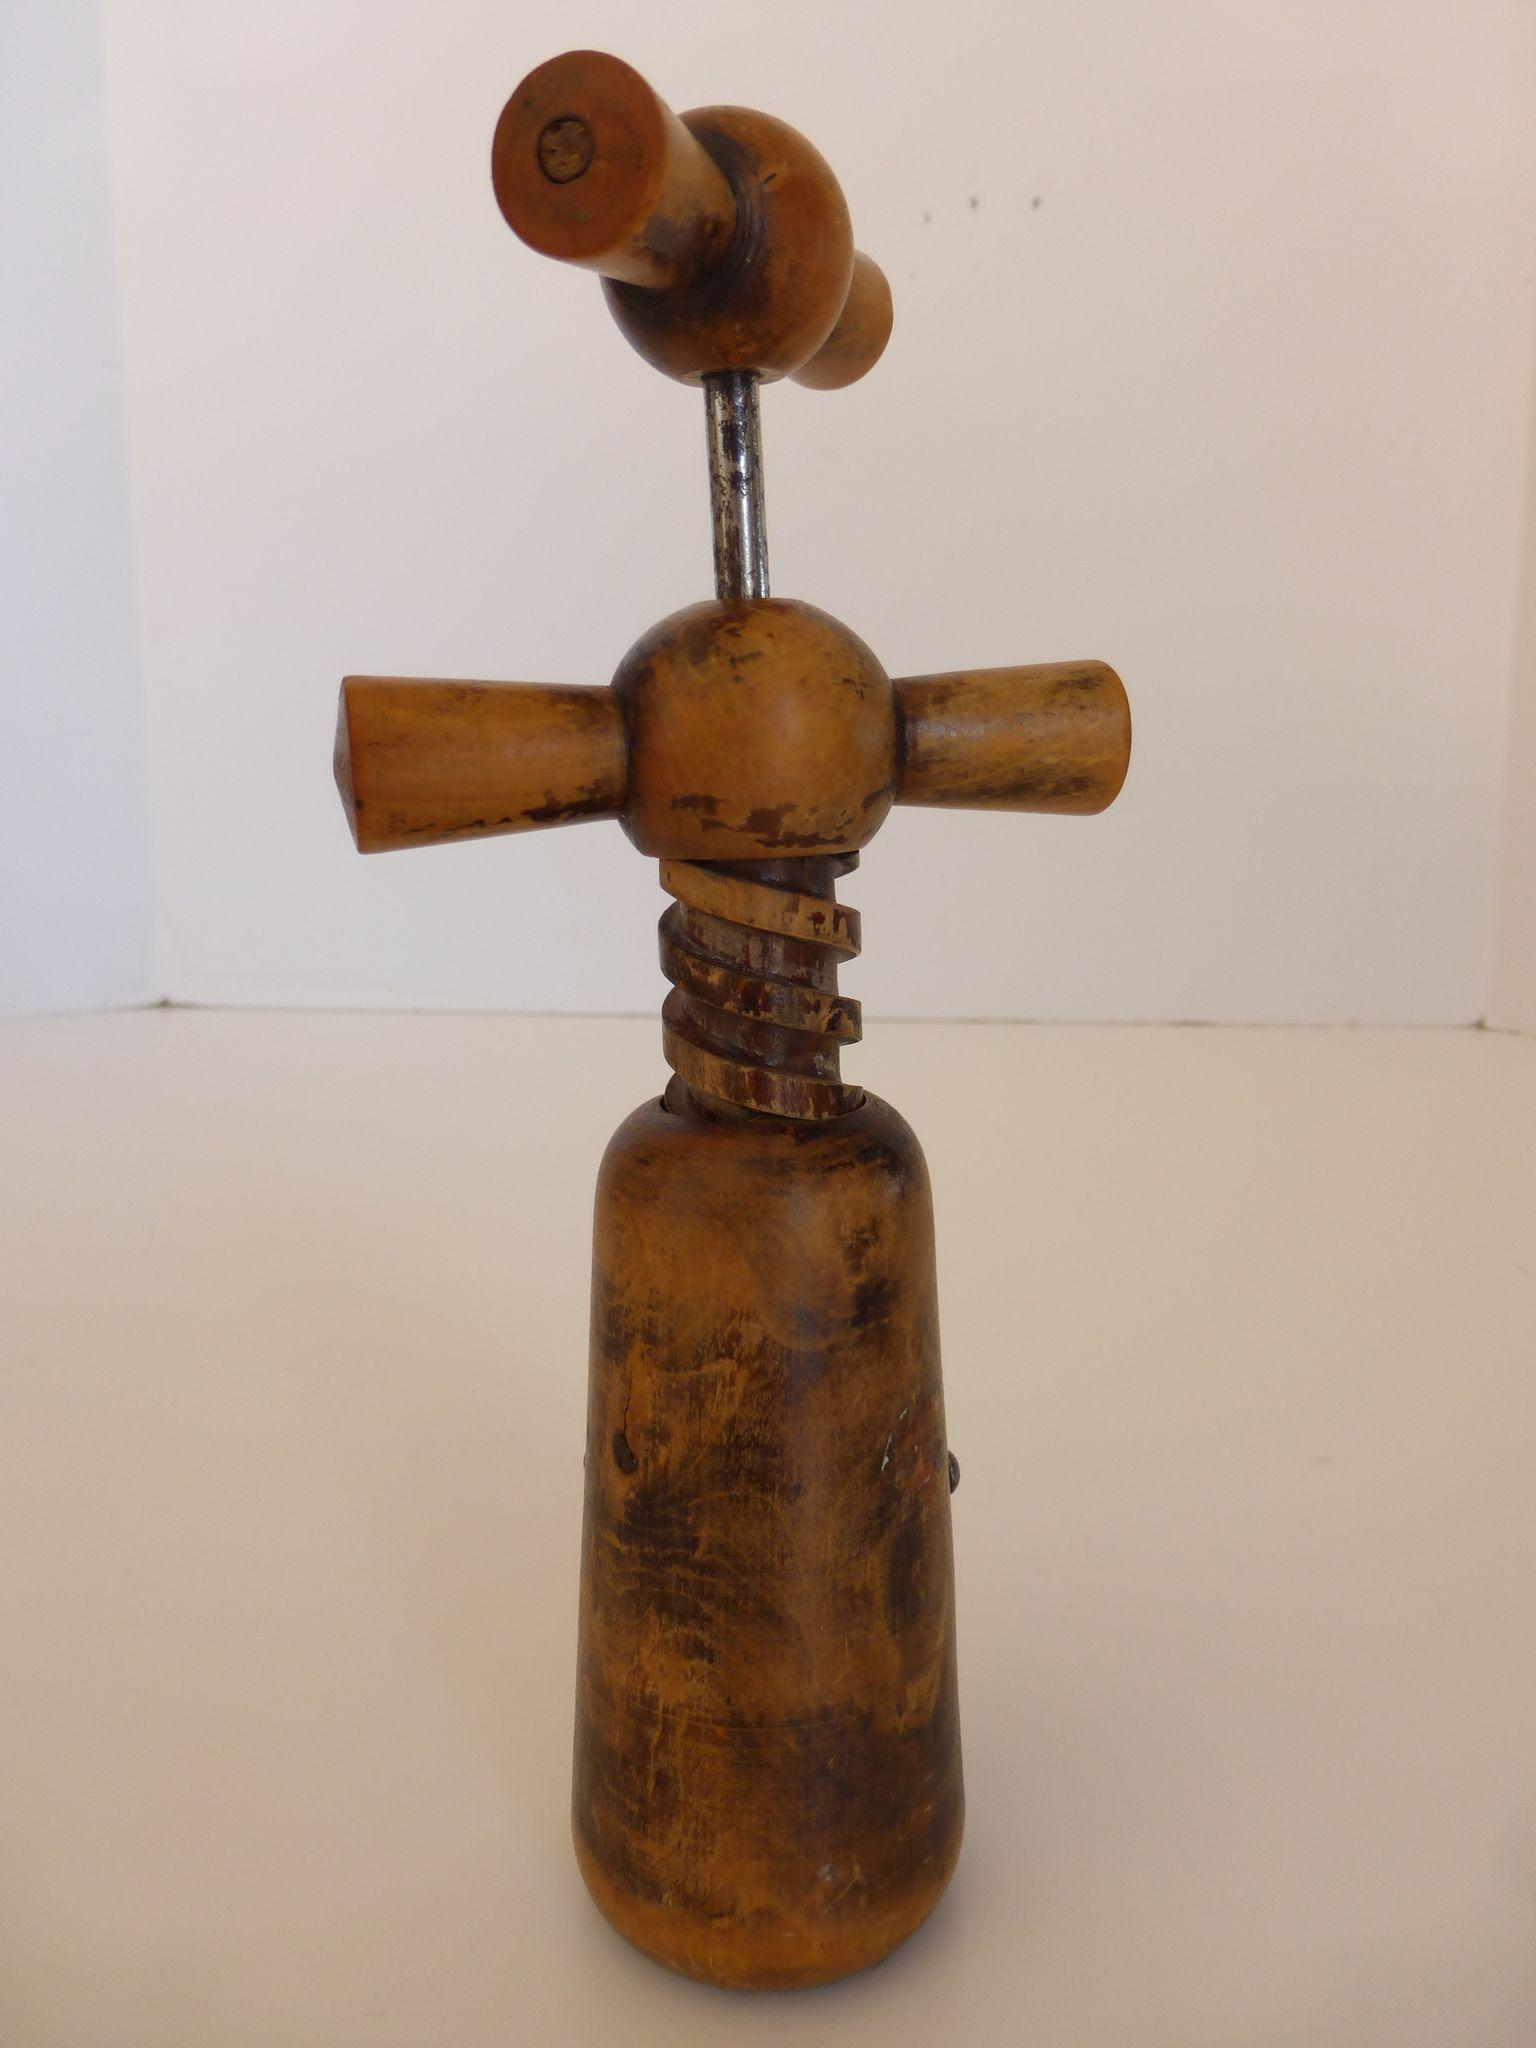 Vintage Double Handle Hand Carved Wood Corkscrew Bottle